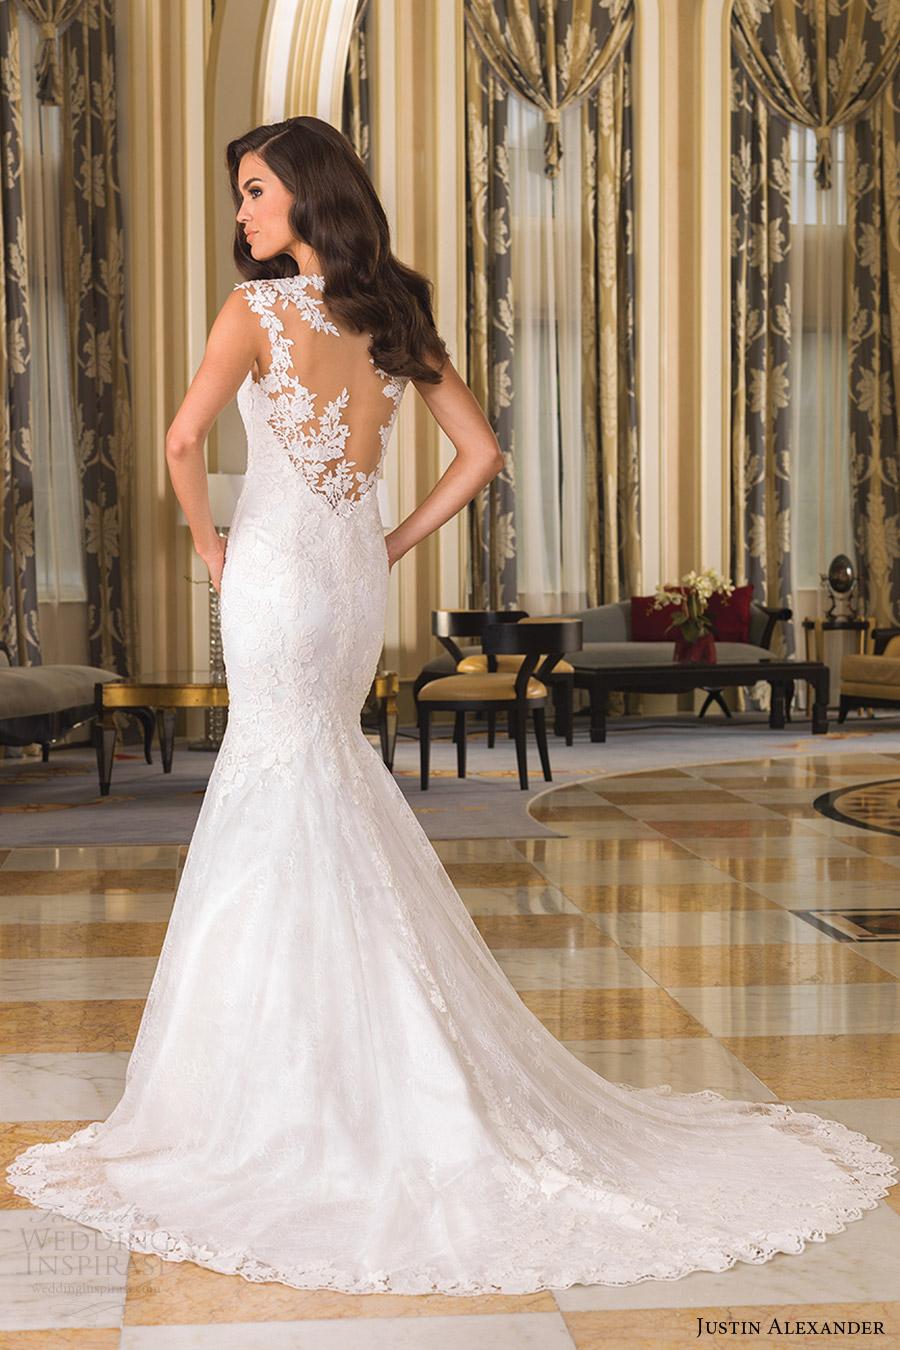 Justin Alexander Fall 2016 Wedding Dresses | Wedding Inspirasi